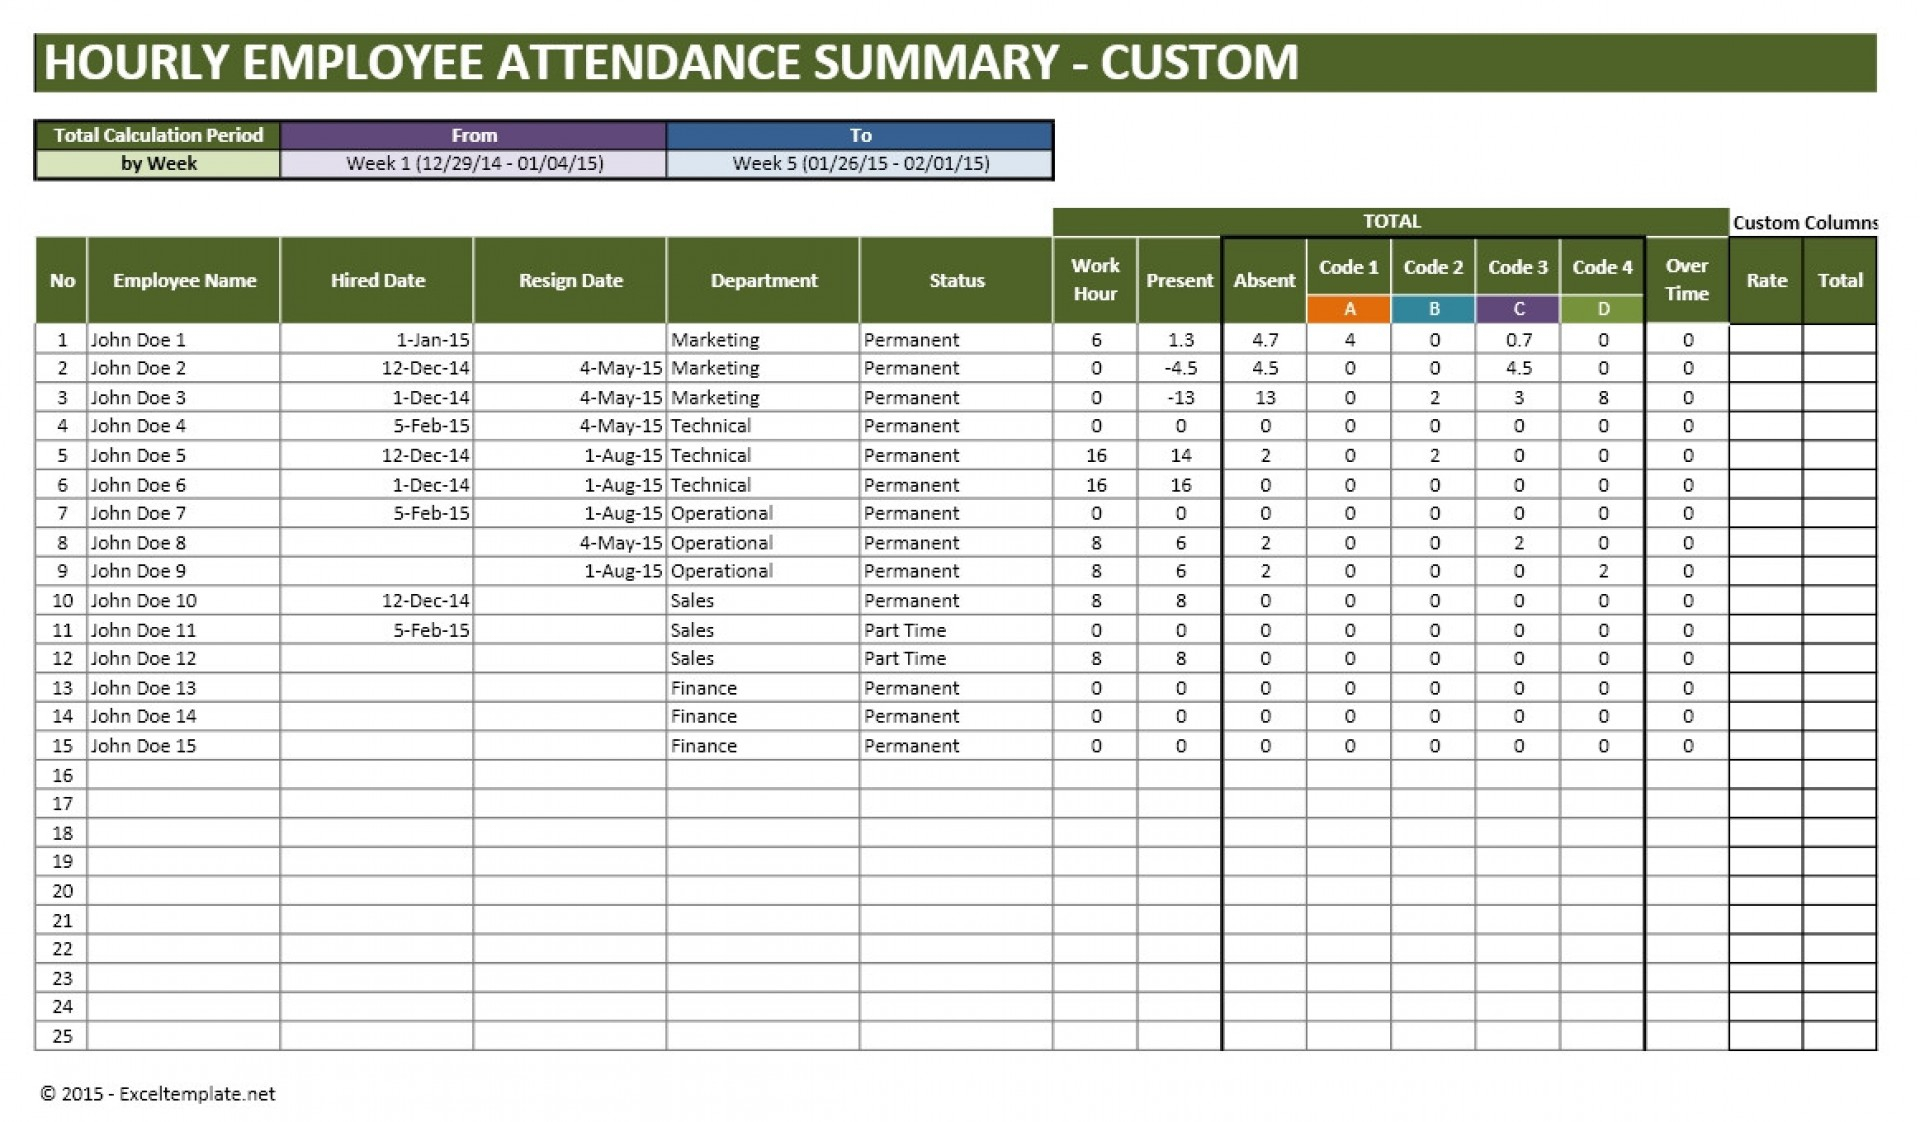 019 Vacation Tracking Calendar Employee Template Excel Pto inside Employee Vacation Tracking Calendar